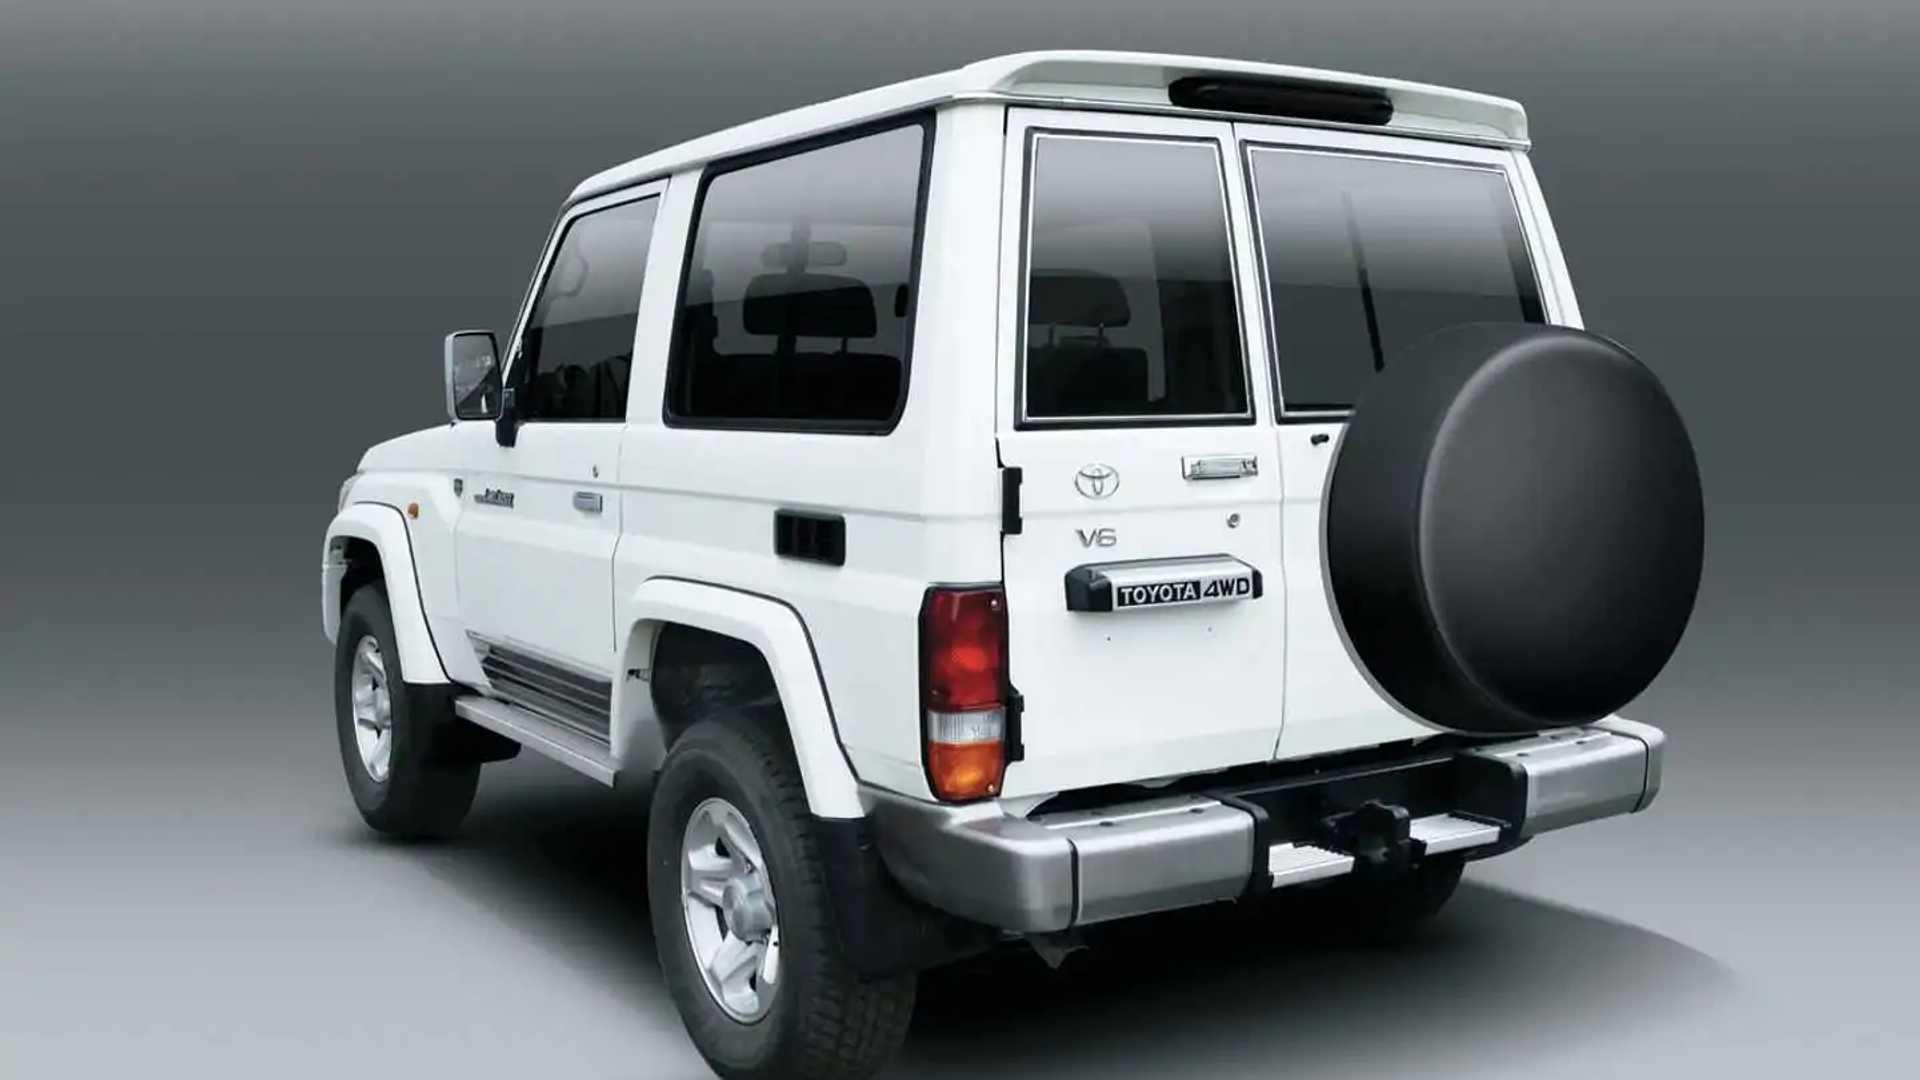 Toyota Land Cruiser 70 in UAE